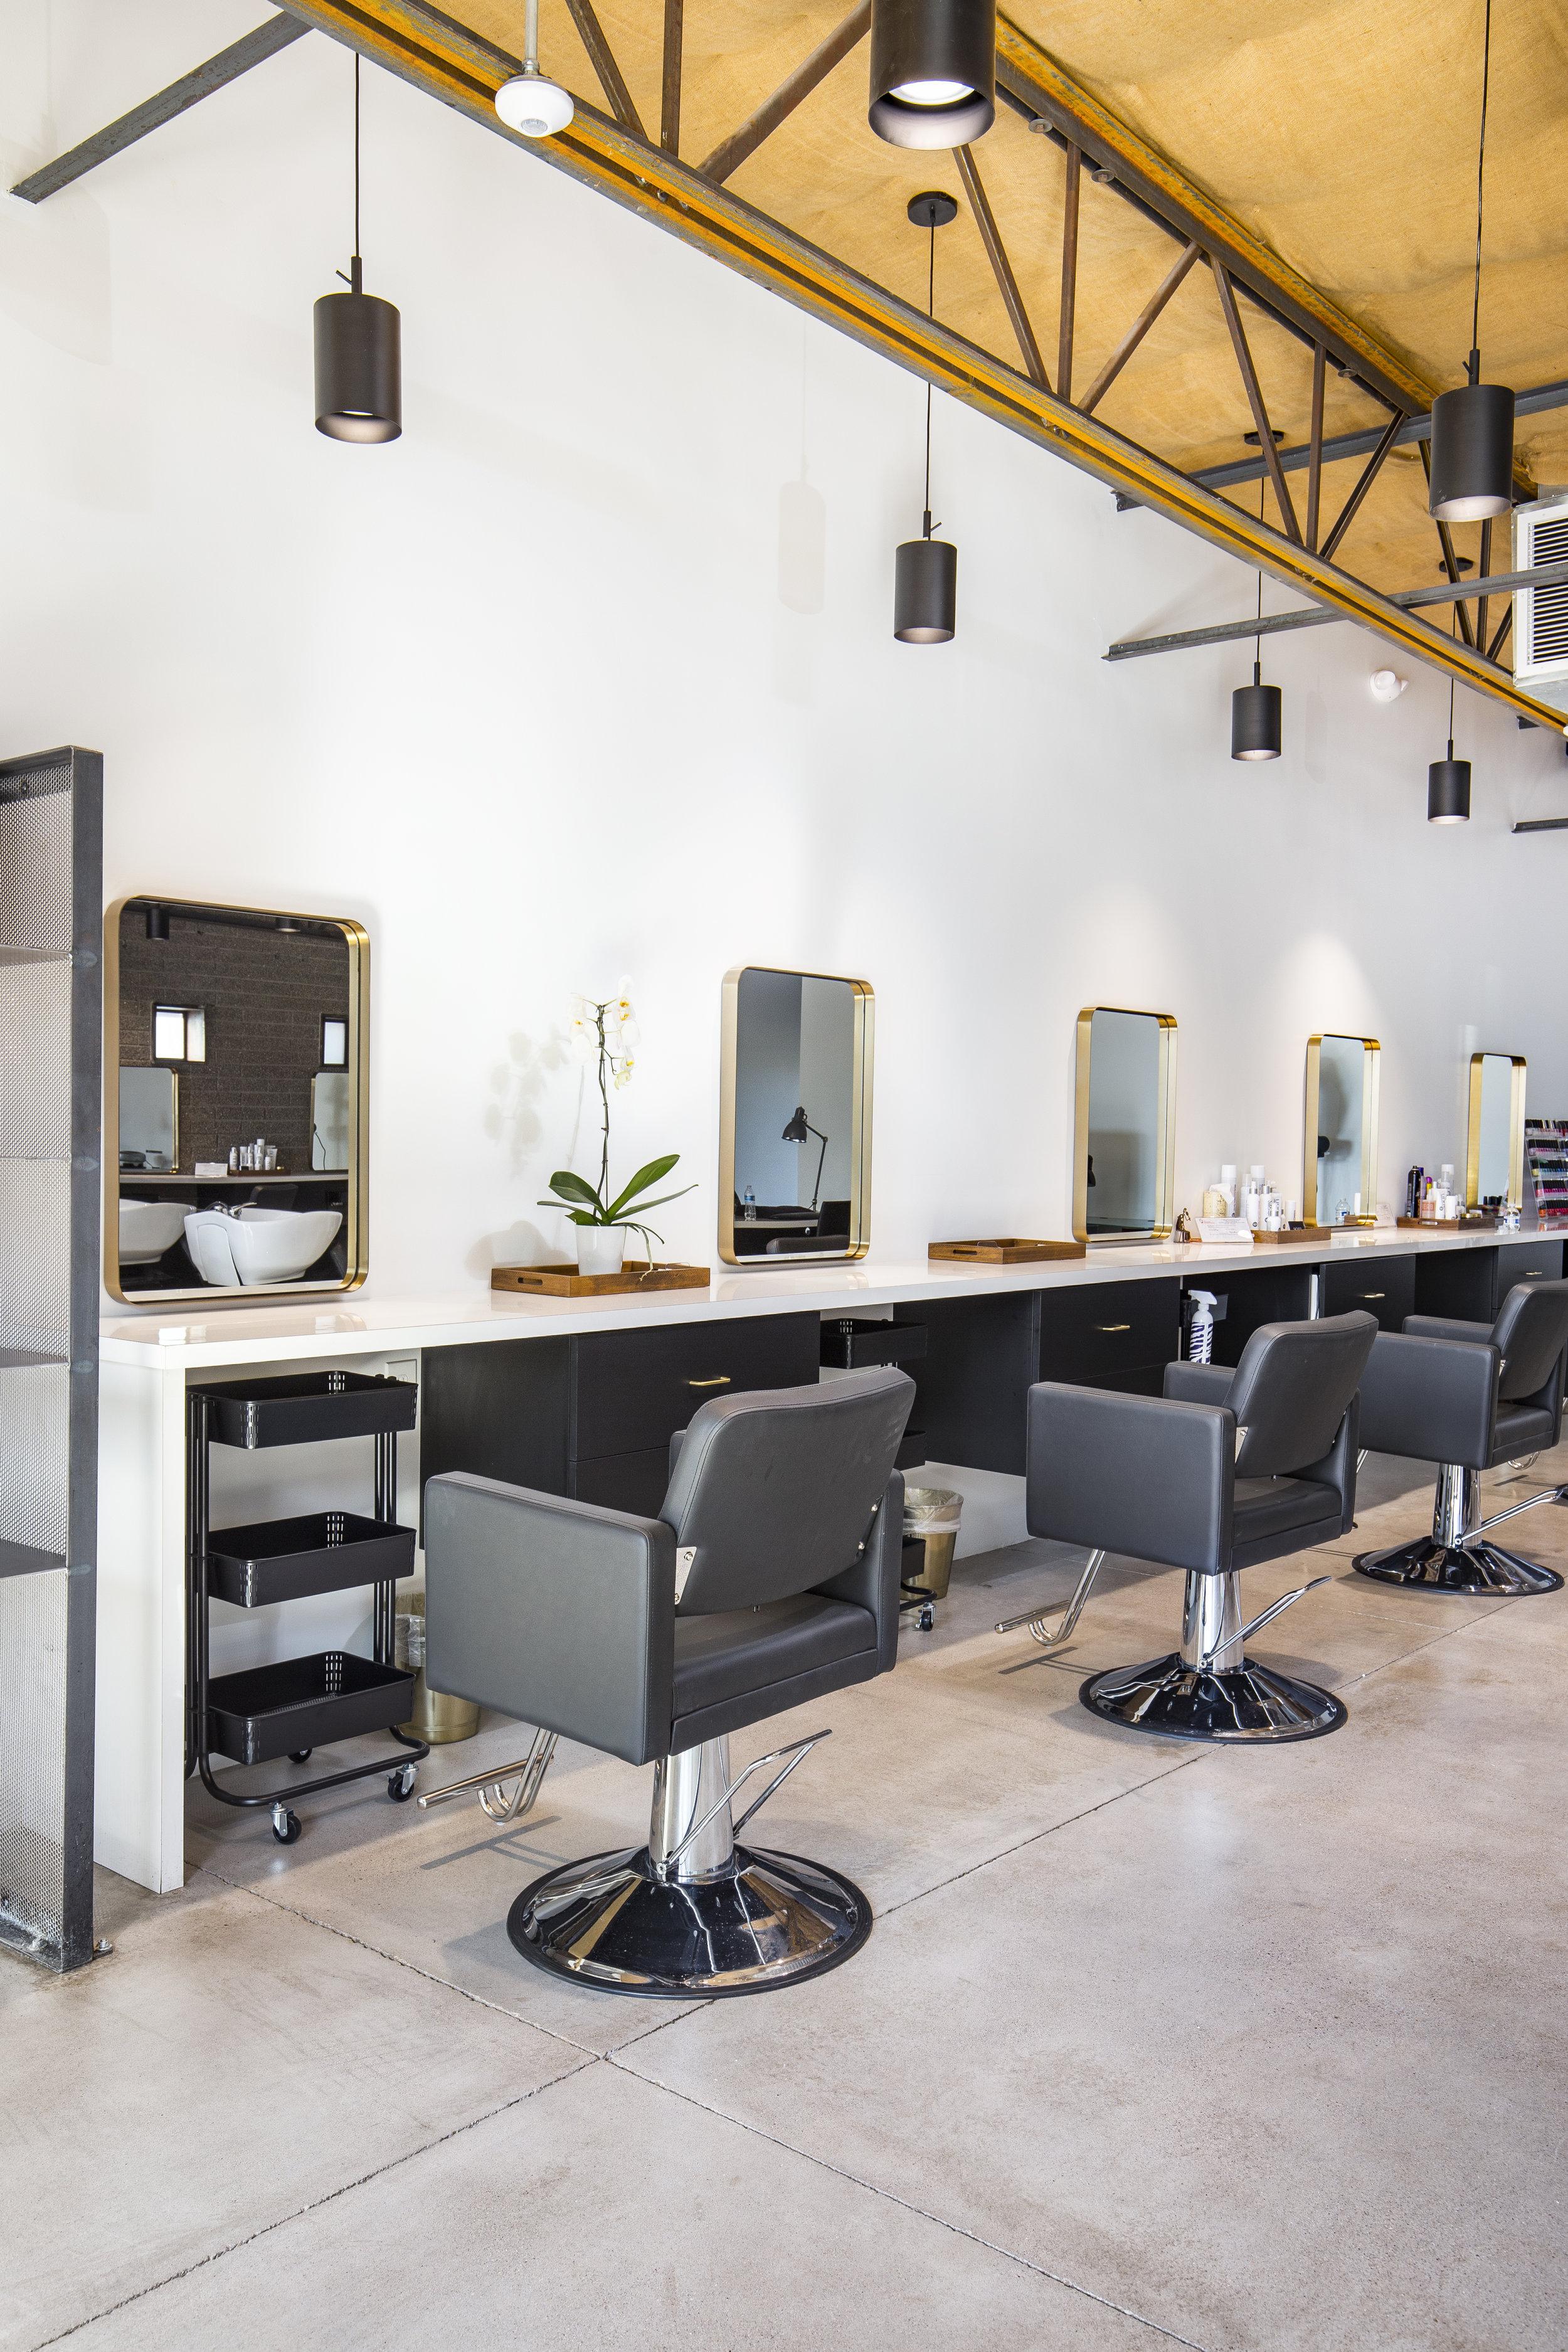 Salon Interior5.jpg